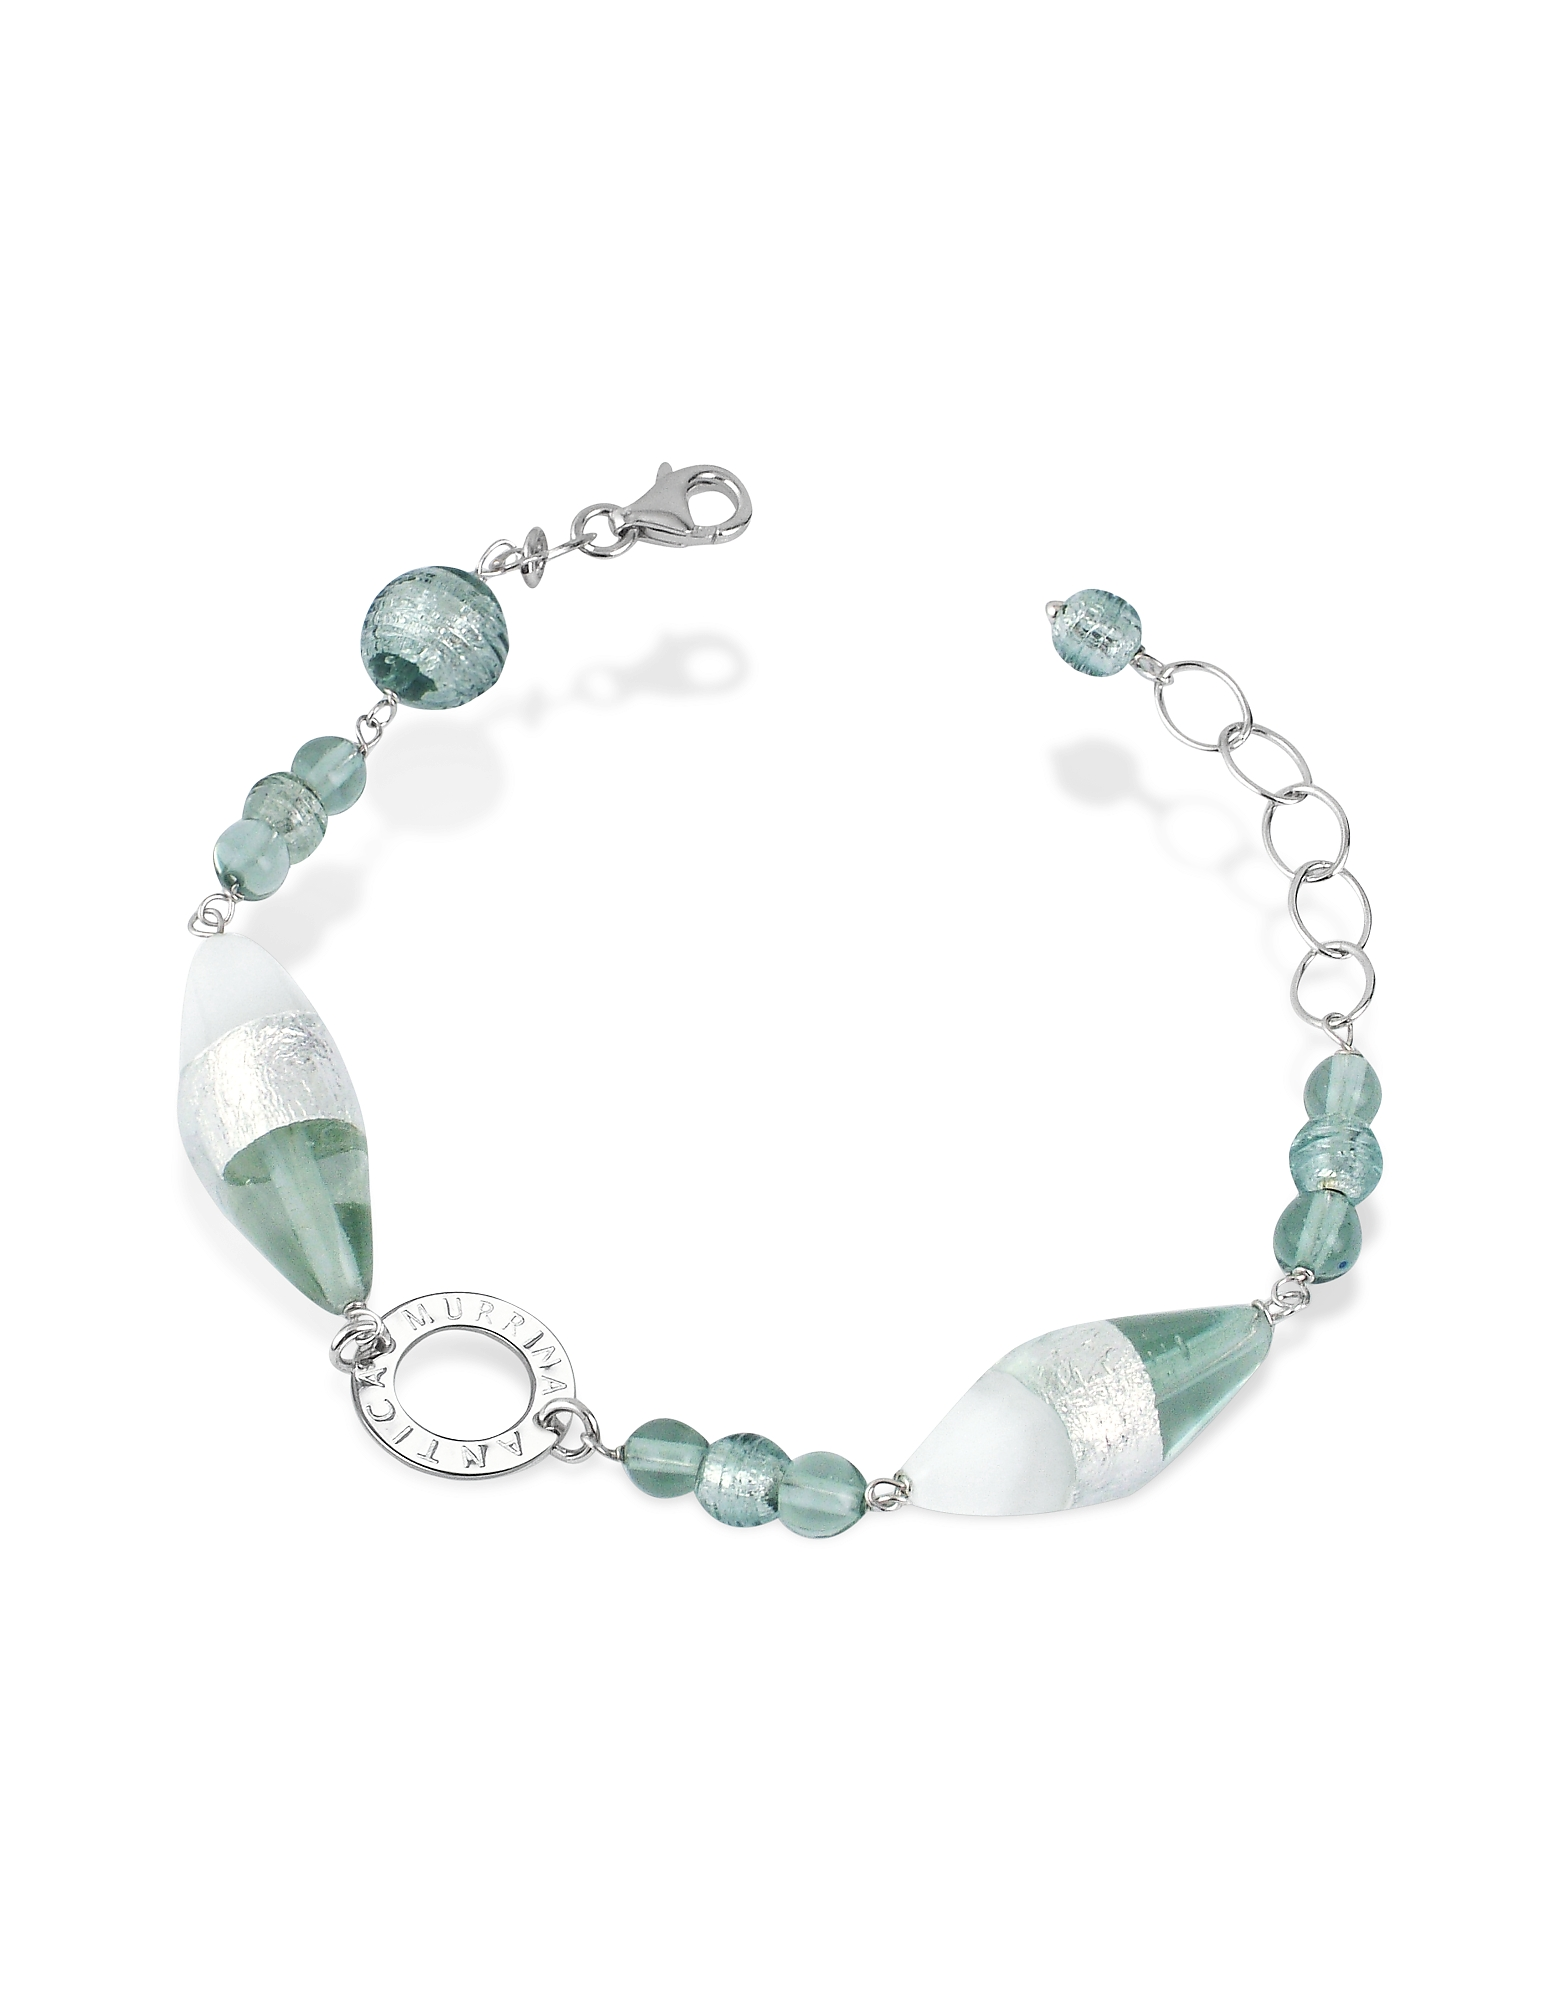 Antica Murrina Bracelets, Liberty - Murano Glass Bead Sterling Silver Bracelet